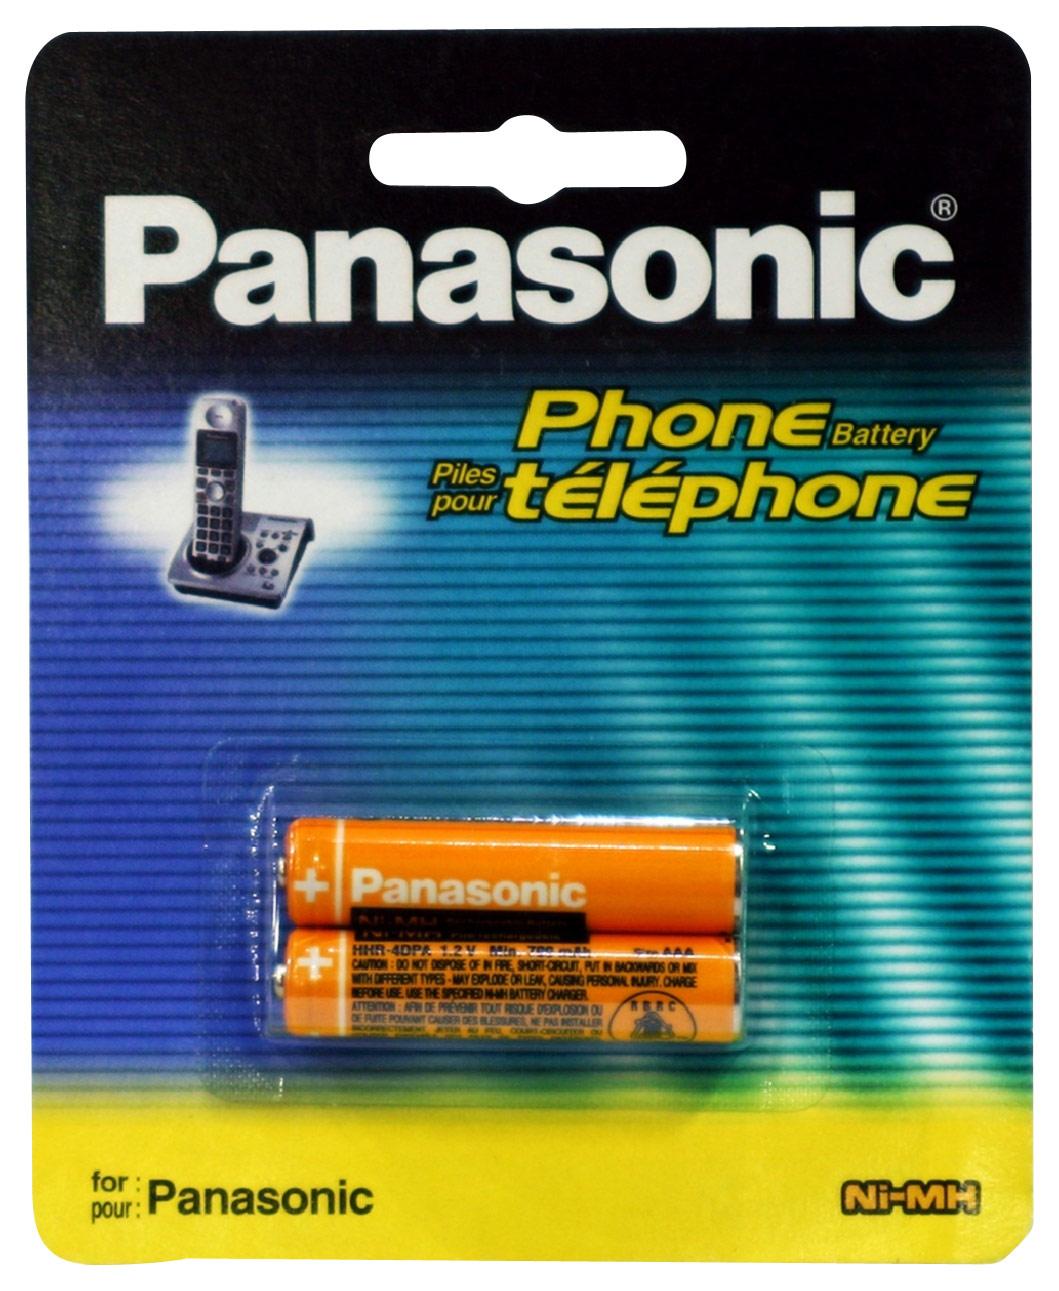 Panasonic - Rechargeable Battery for Select Panasonic Cordless Telephones - Orange